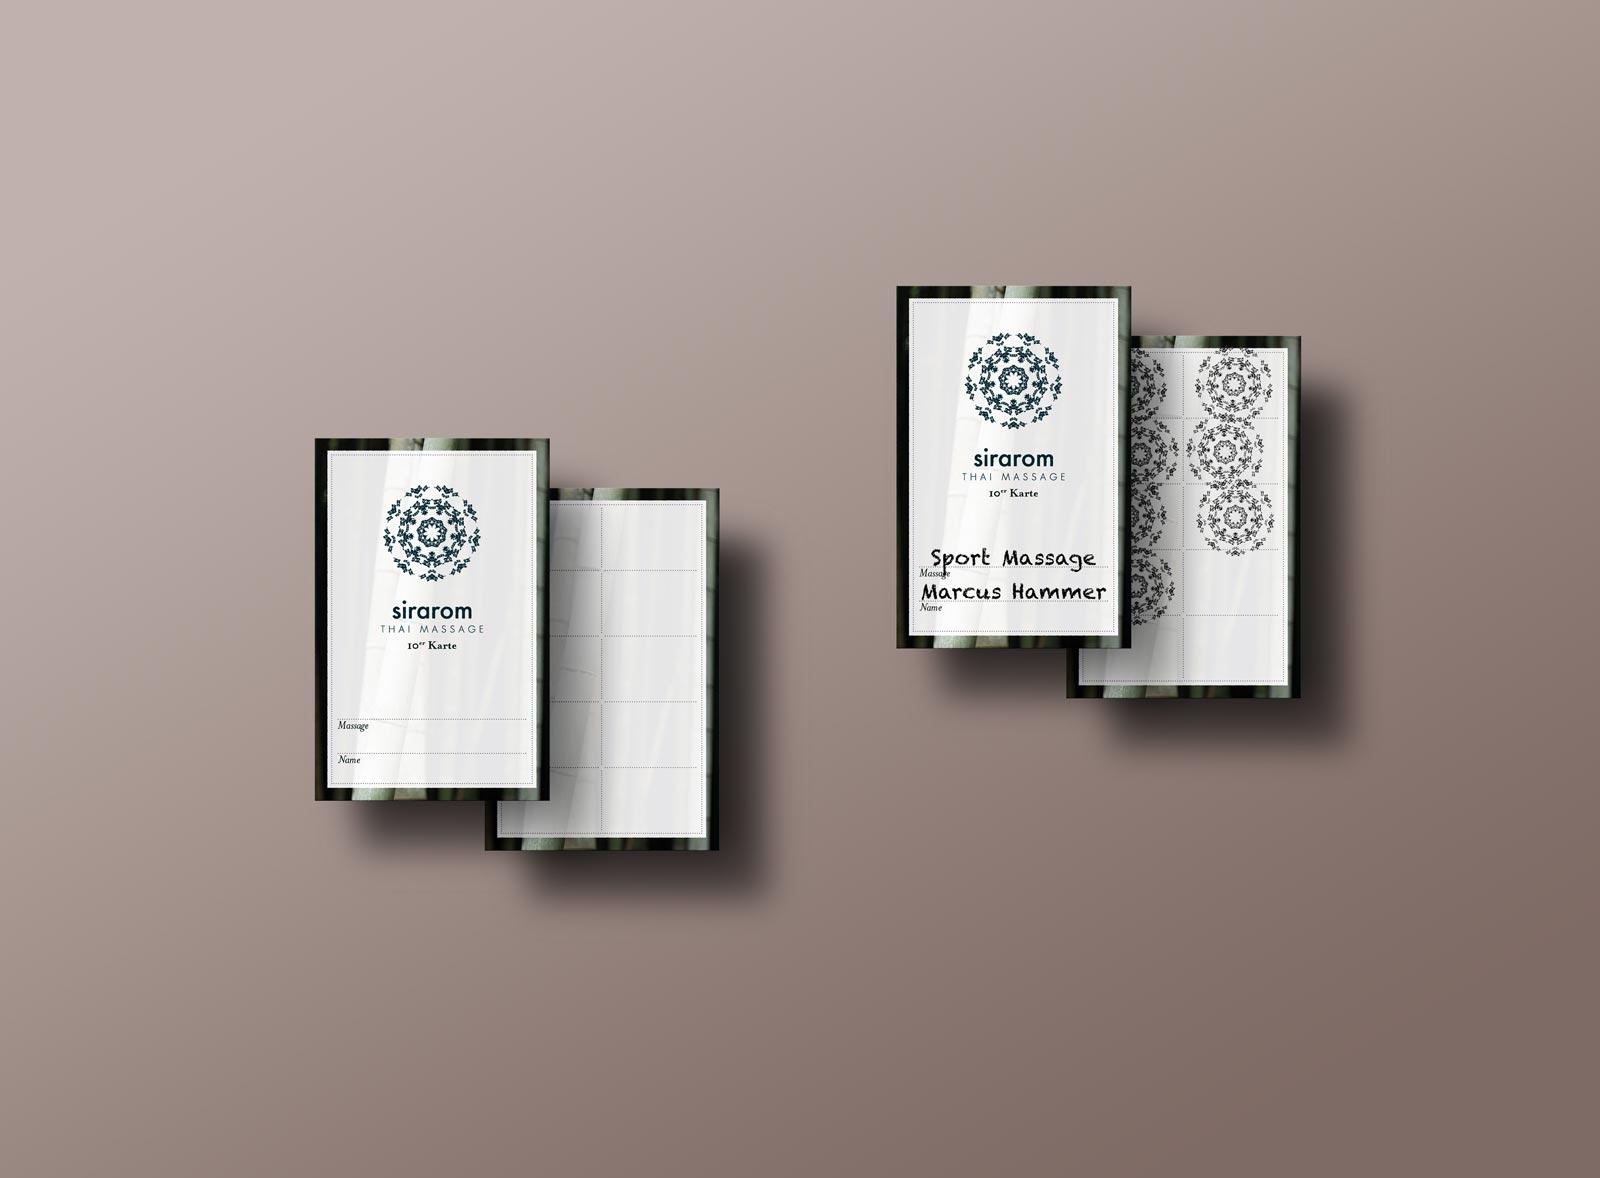 sirarom Thai Massage Stempelkarte Geschäftsausstattung Corporate Design Gesa Siebert Kommunikationsdesign